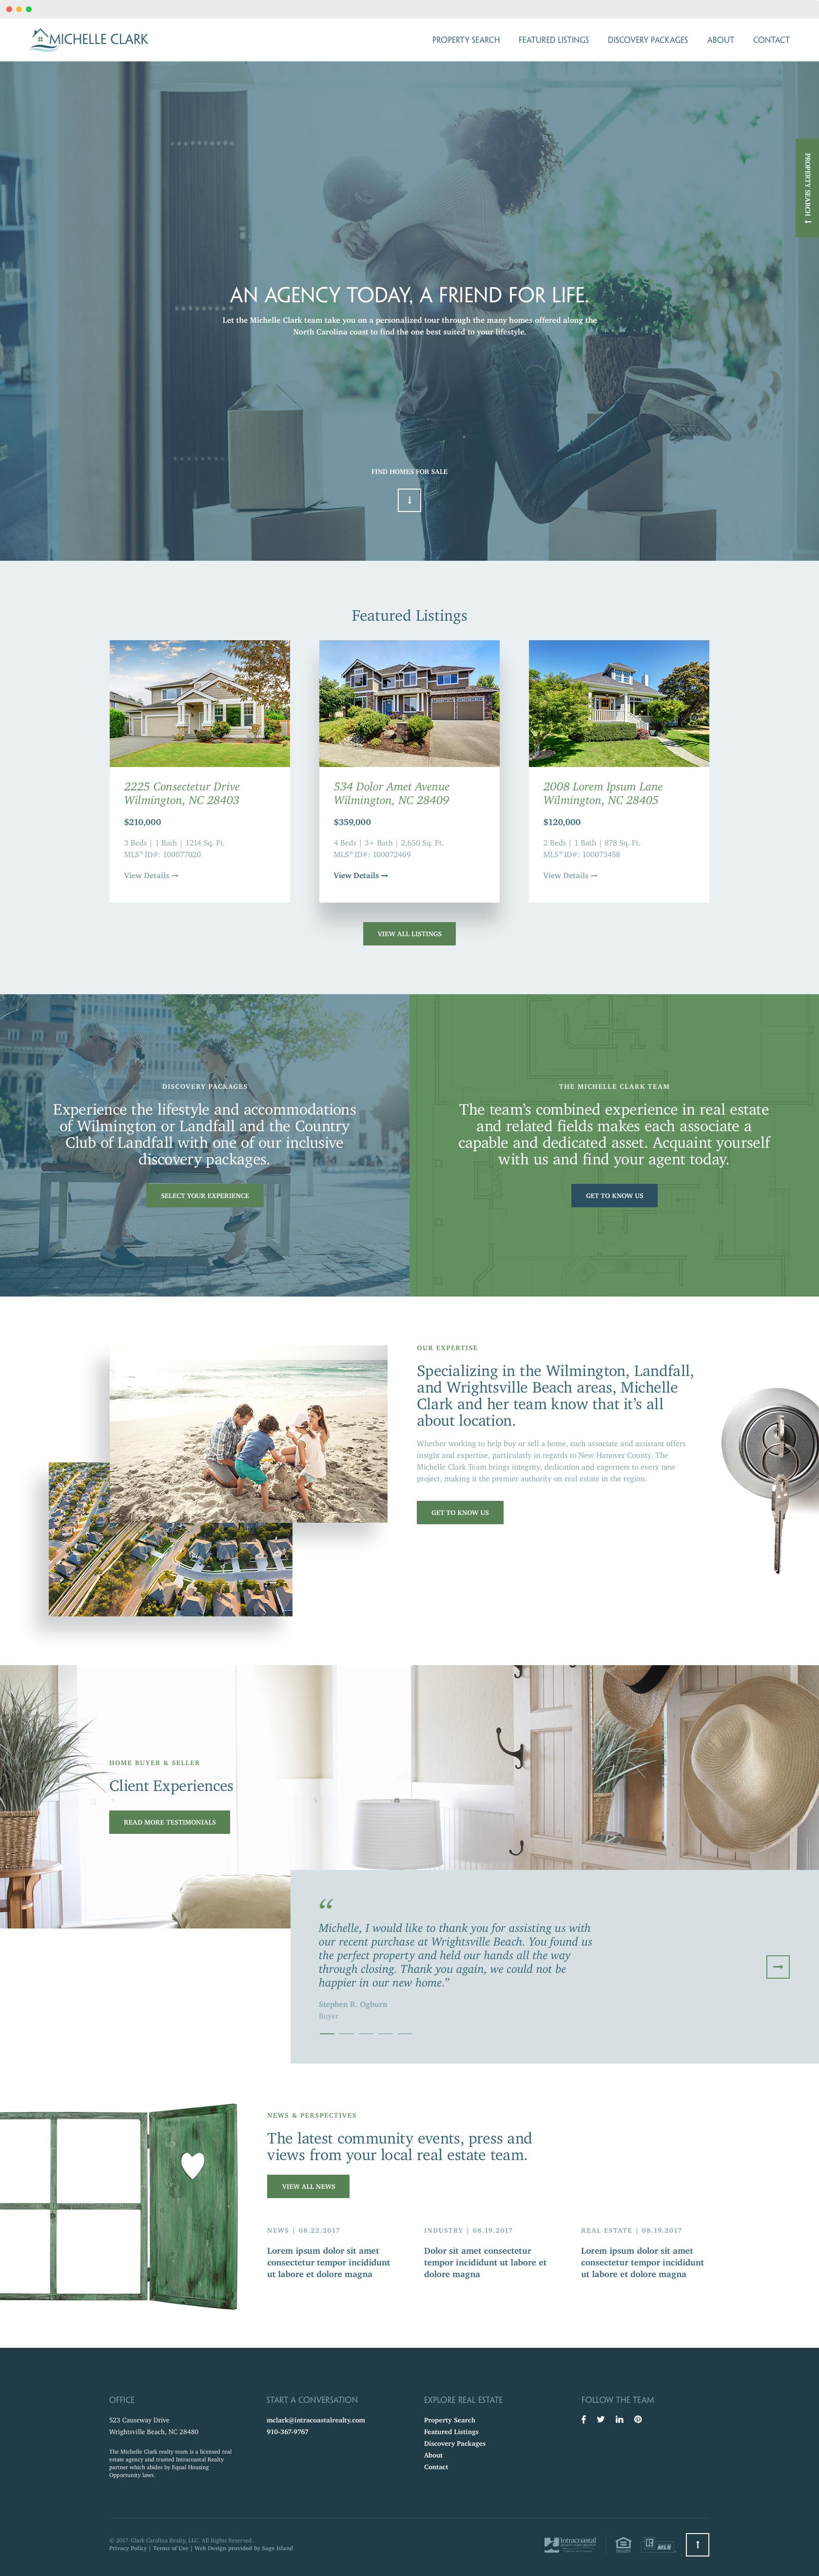 Michelle Clark Team Real Estate Agency Site Design